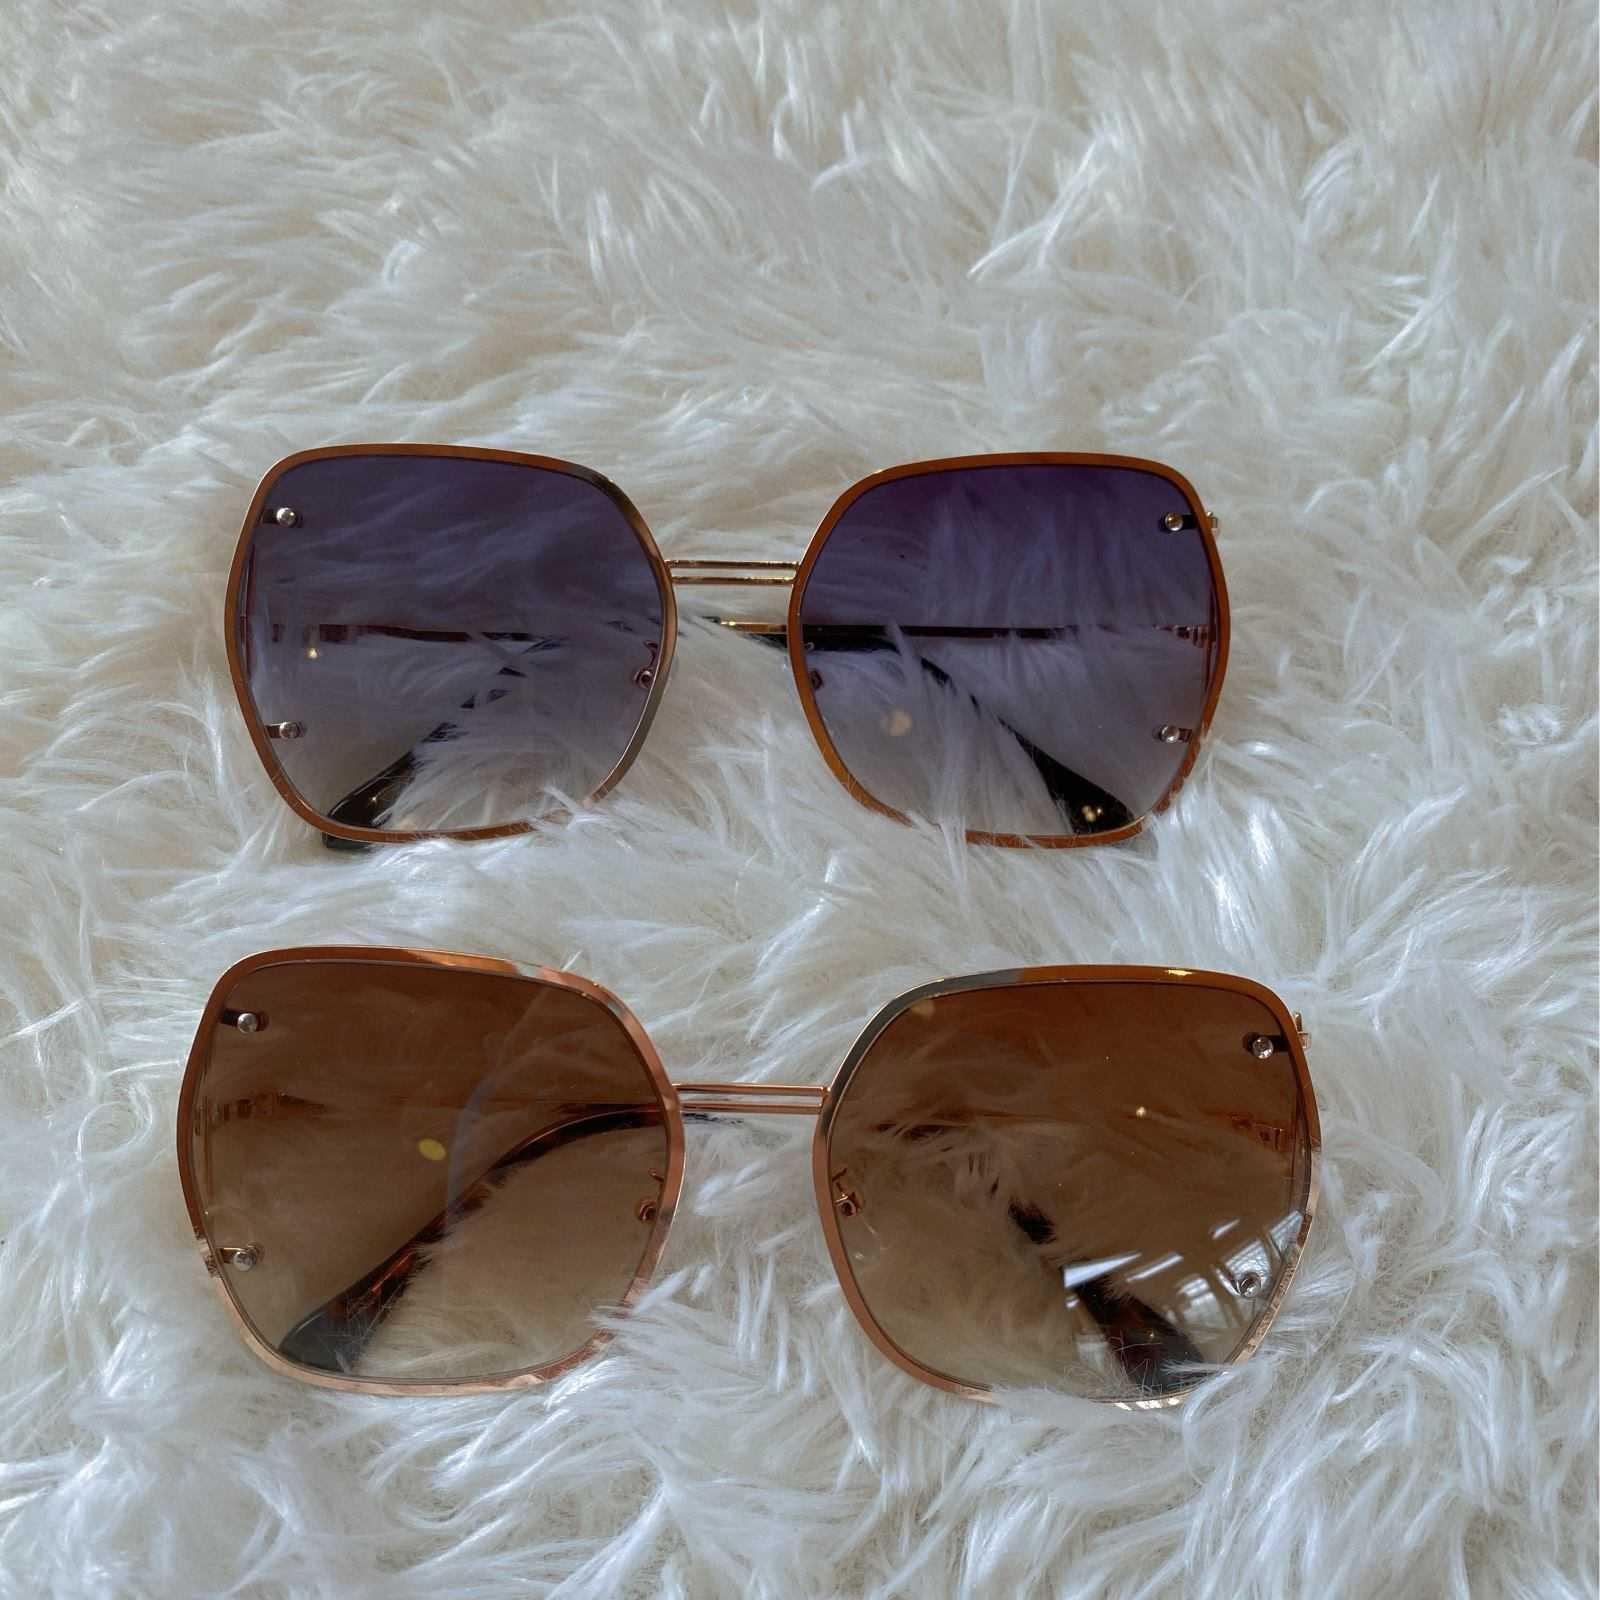 Im Kaka 1995 Sunglasses Women 2020 new temperament Sunglasses gray brown drivers glasses